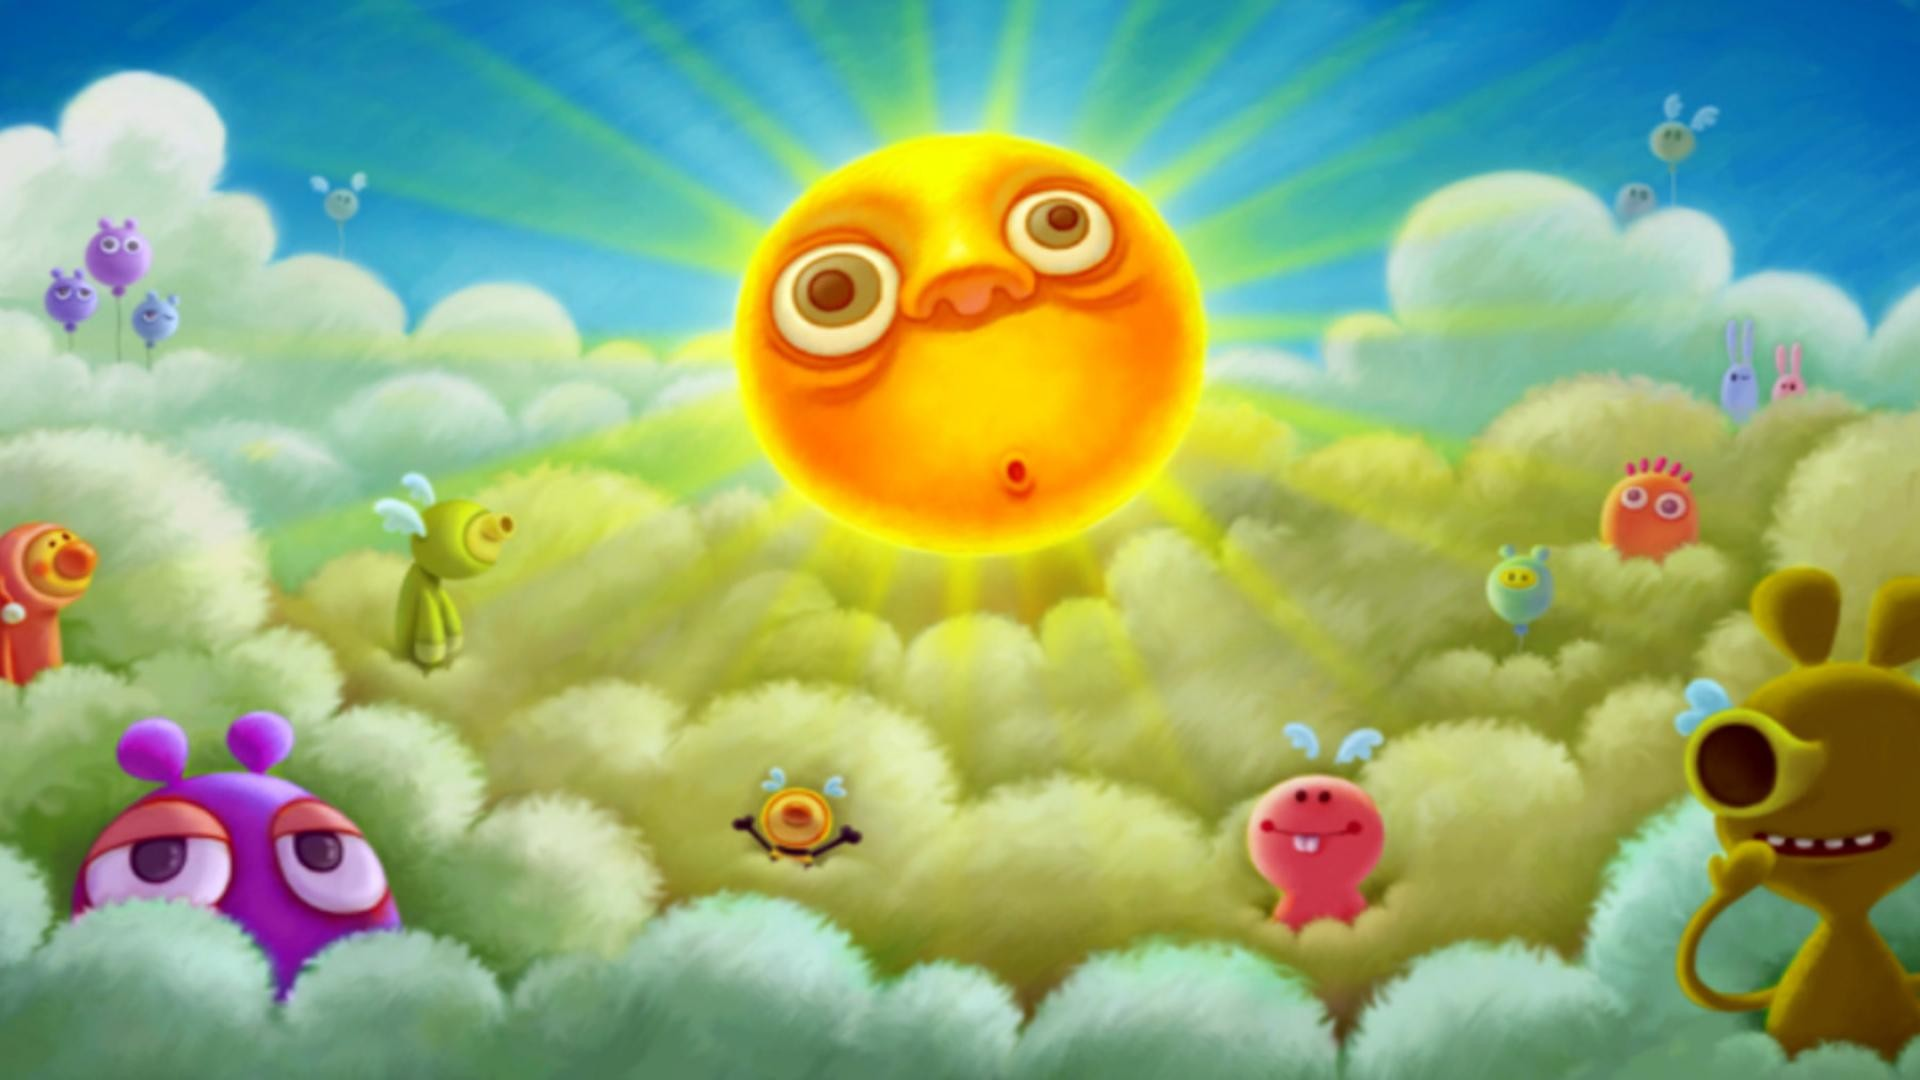 27 Animated Cartoon Wallpaper Android Baka Wallpaper